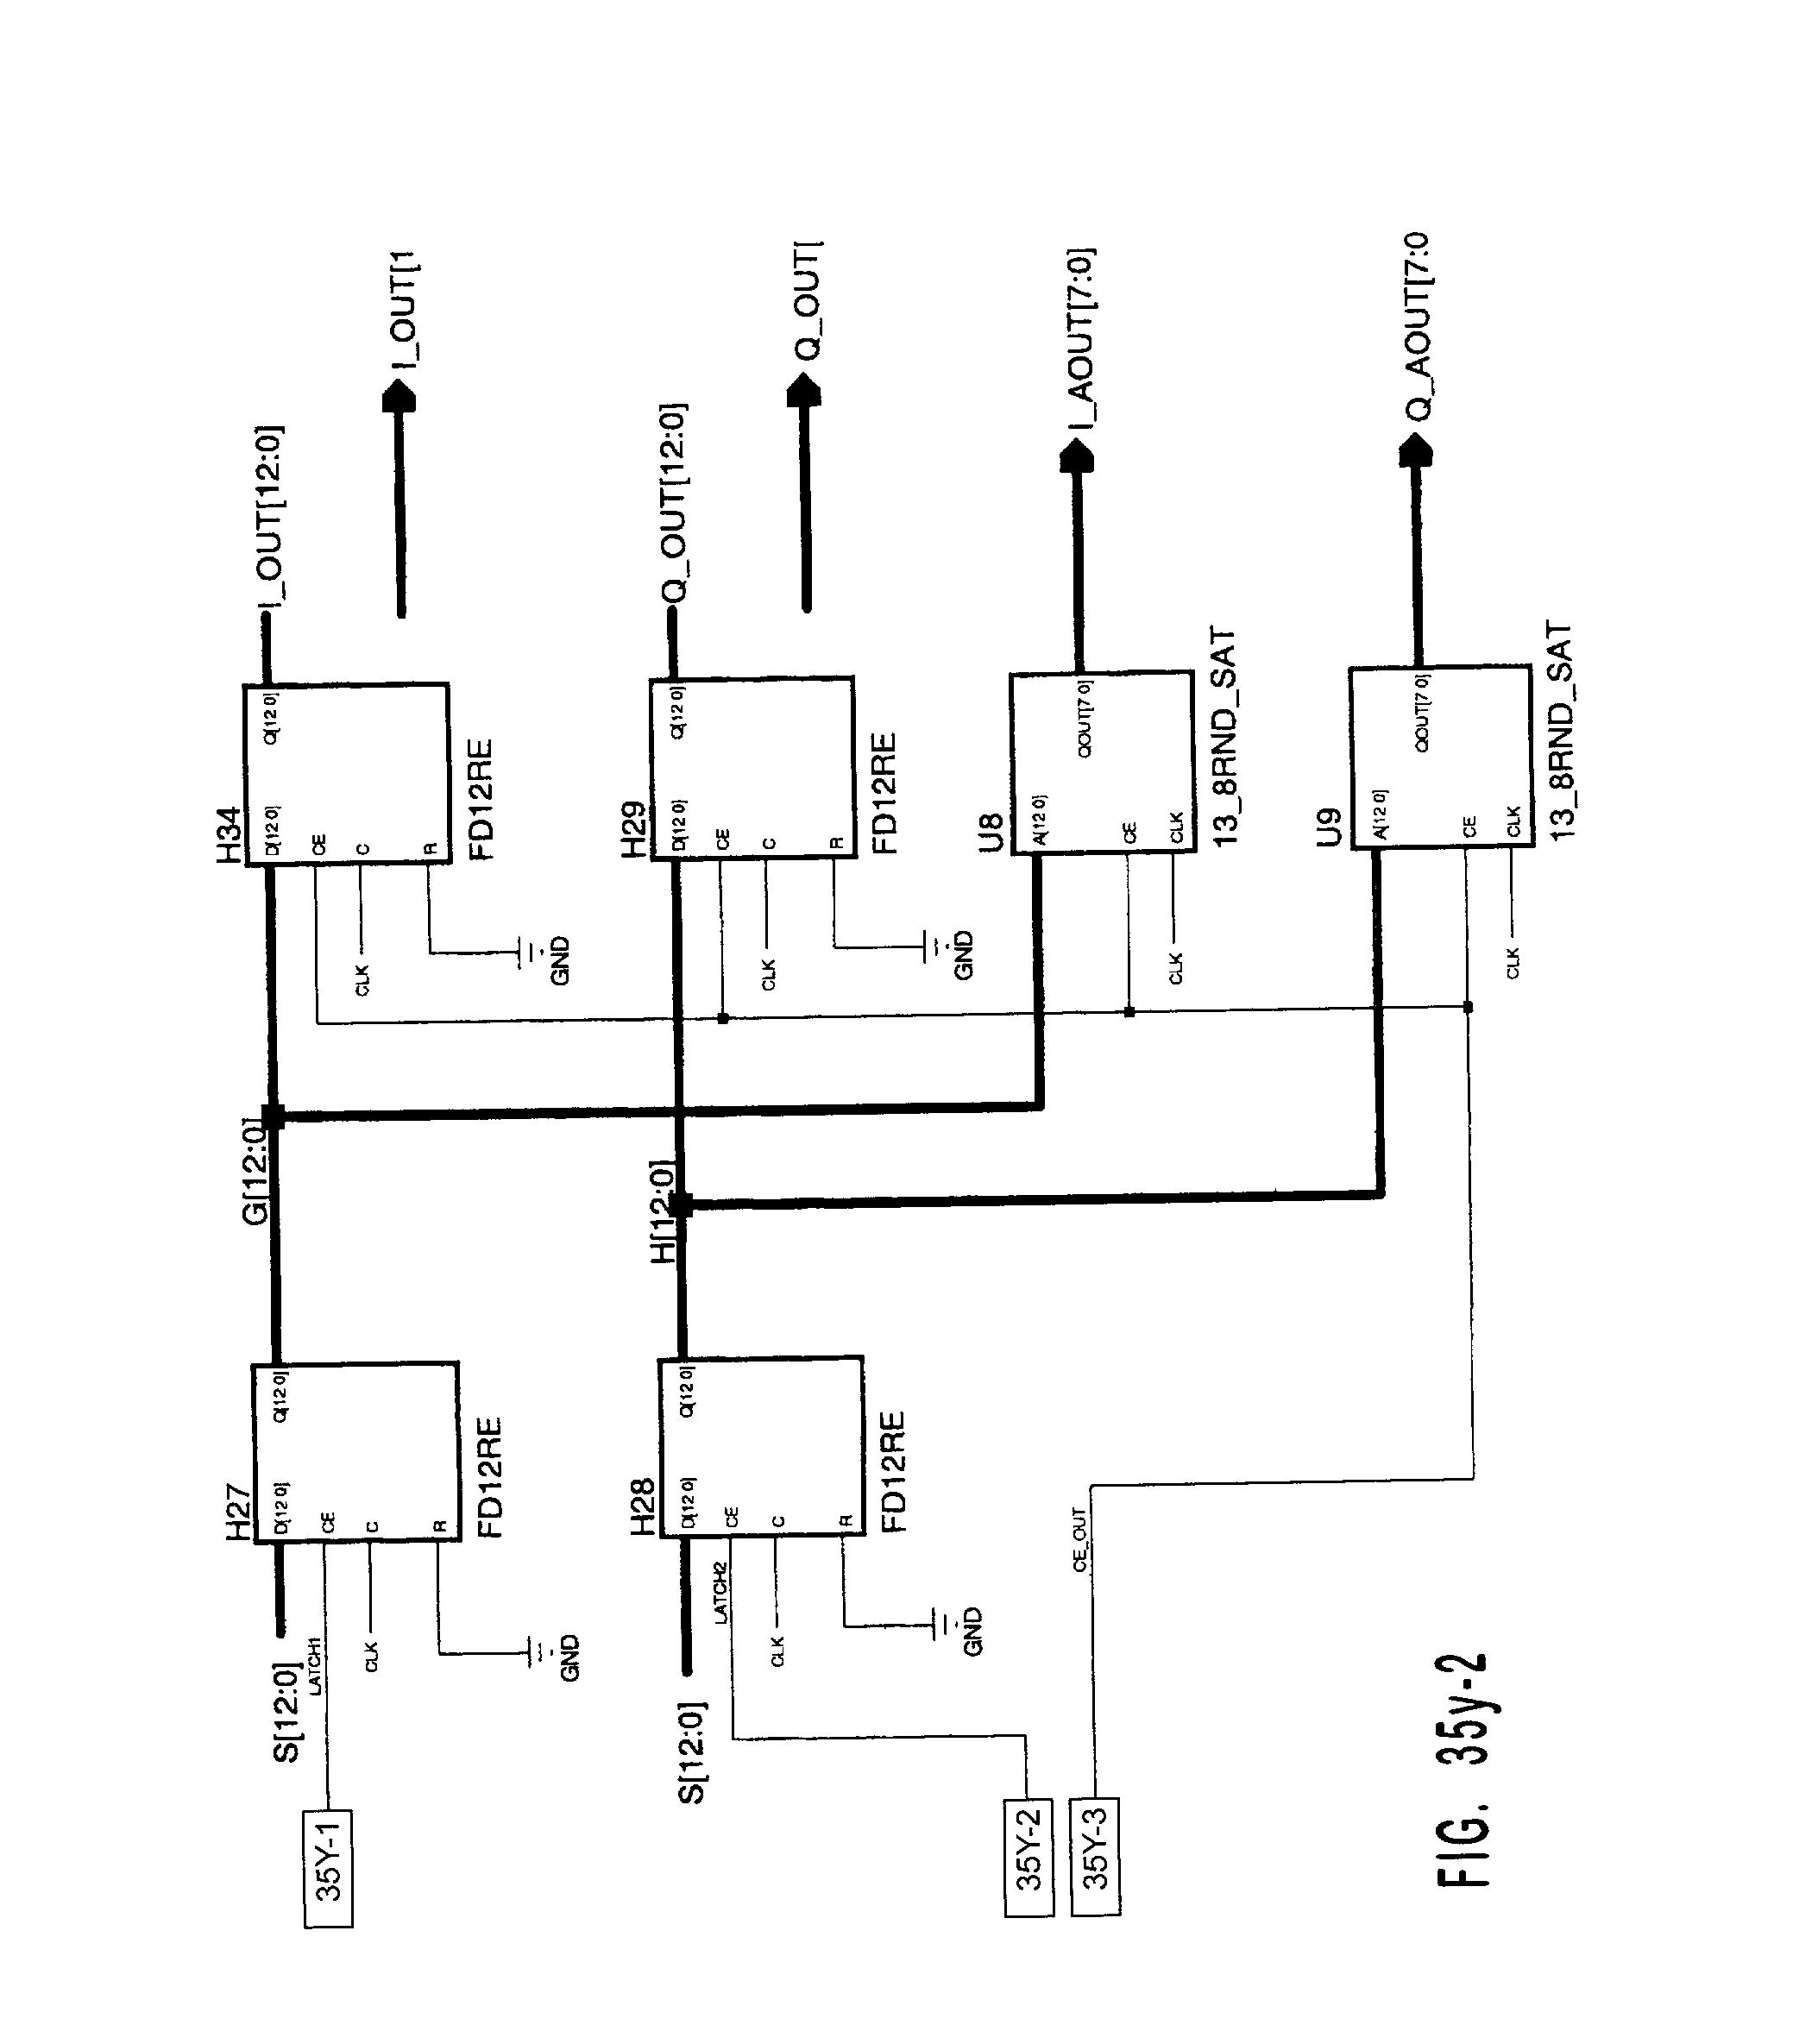 Leviton 41106 Rw6 Wiring Diagram : 32 Wiring Diagram